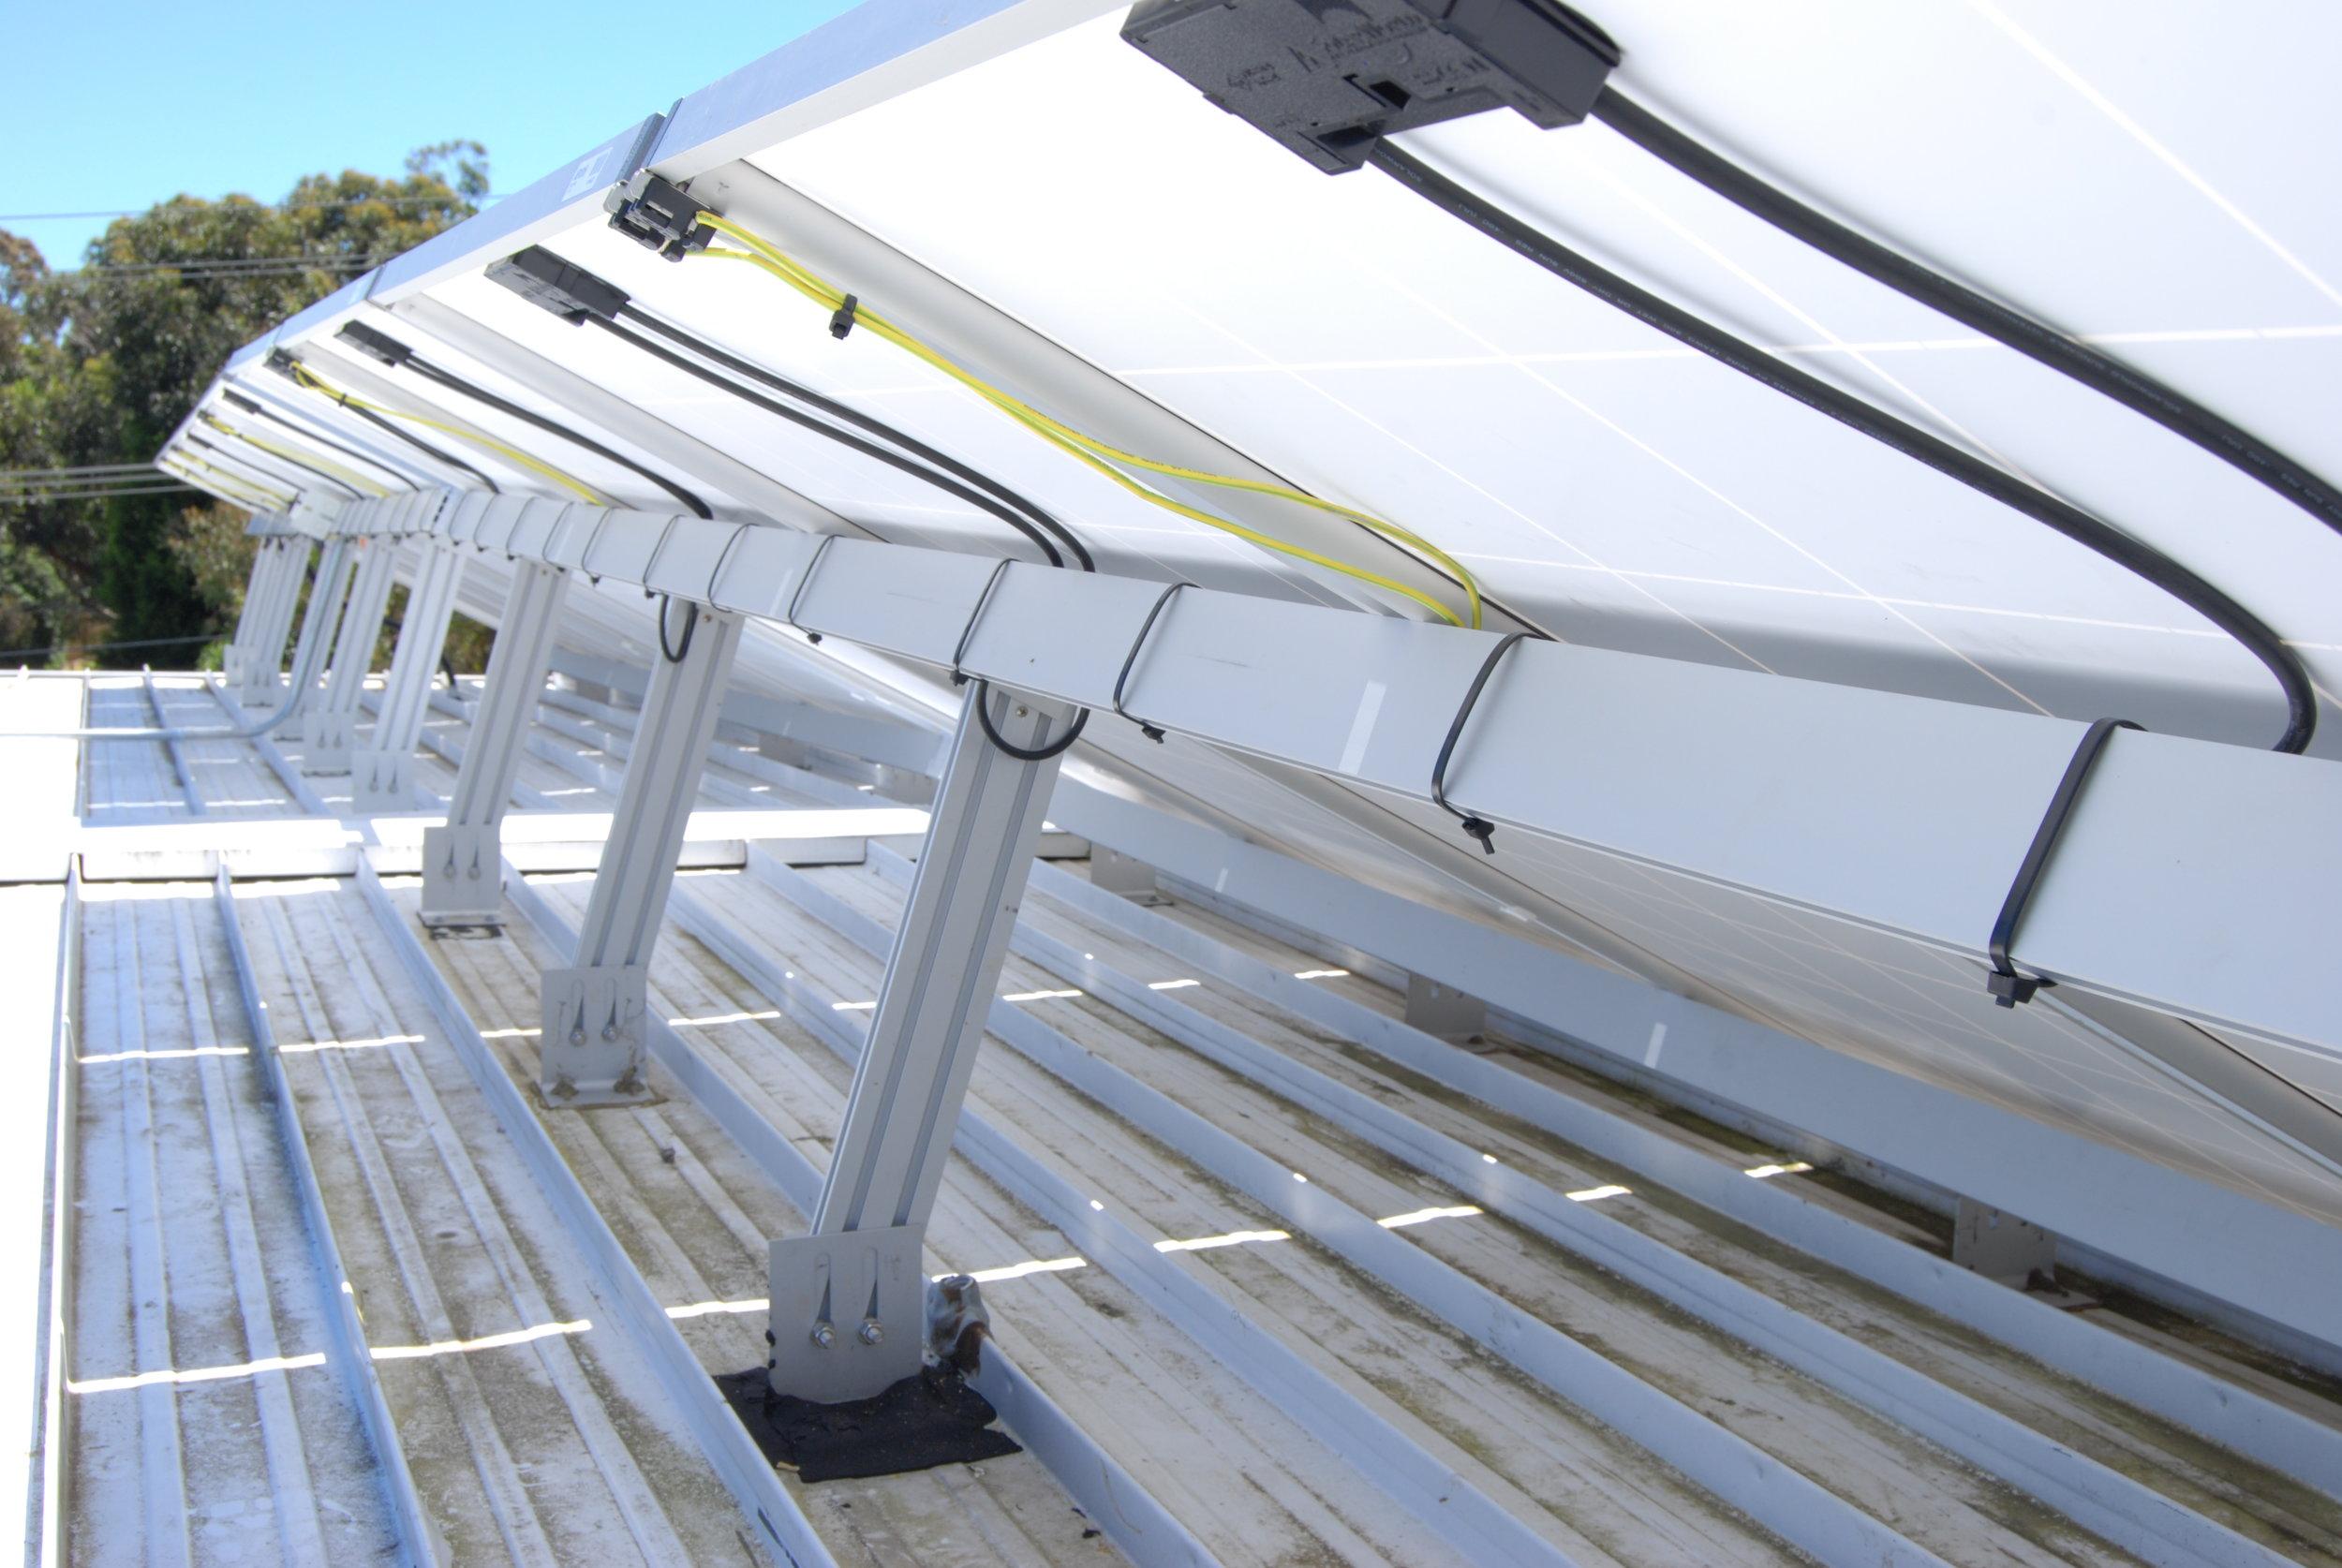 2011, 4.4kWp PV Plant - Heathmont, Victoria